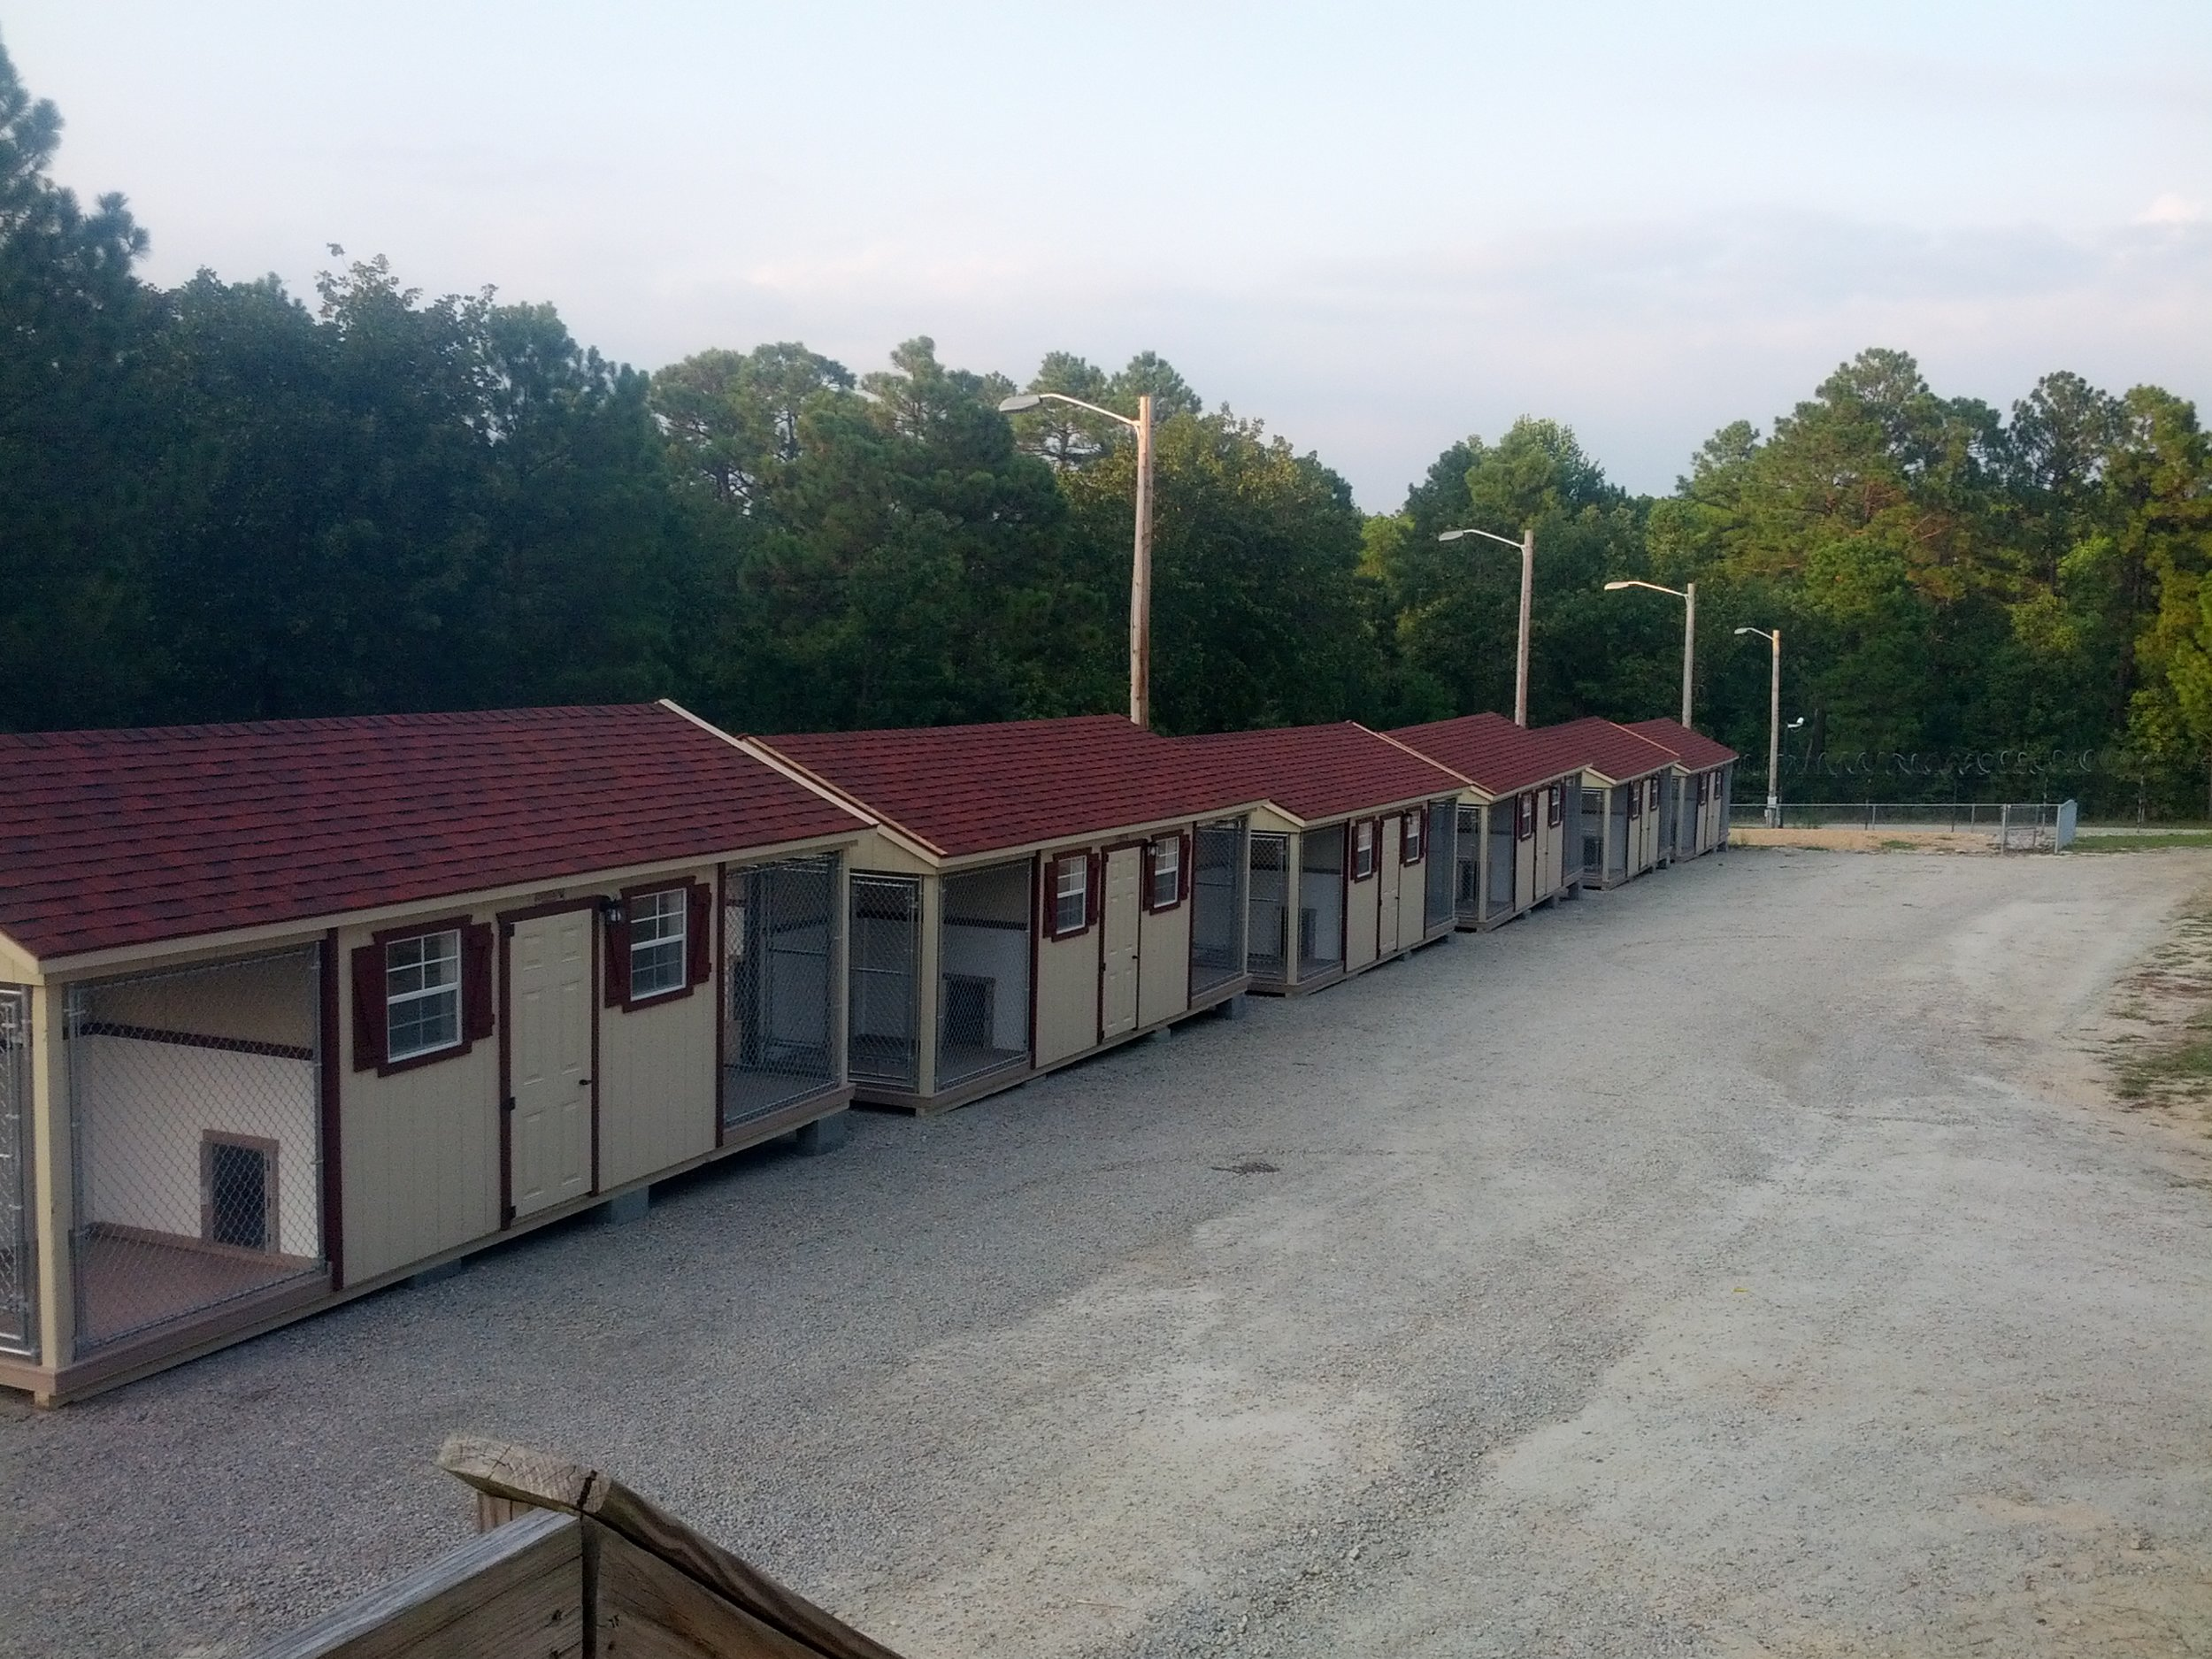 Six Quadplexes Installed on Location